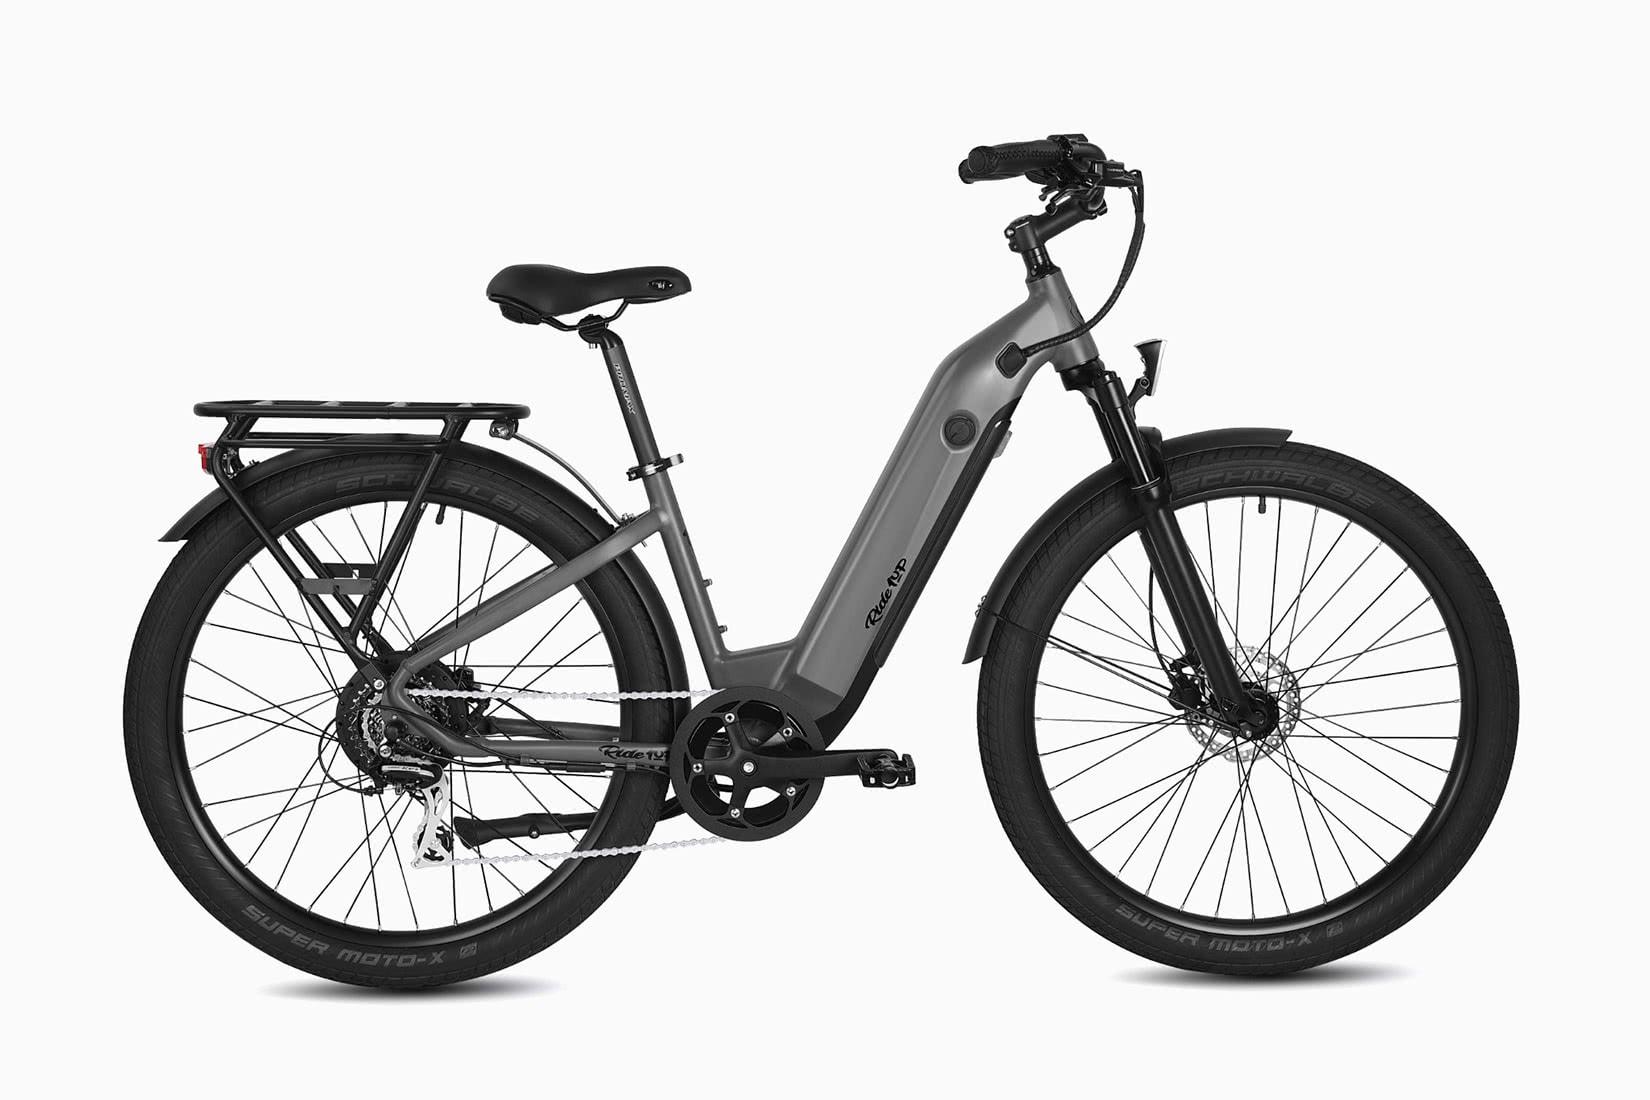 best electric bikes versatile ride1up 700 series review - Luxe Digital